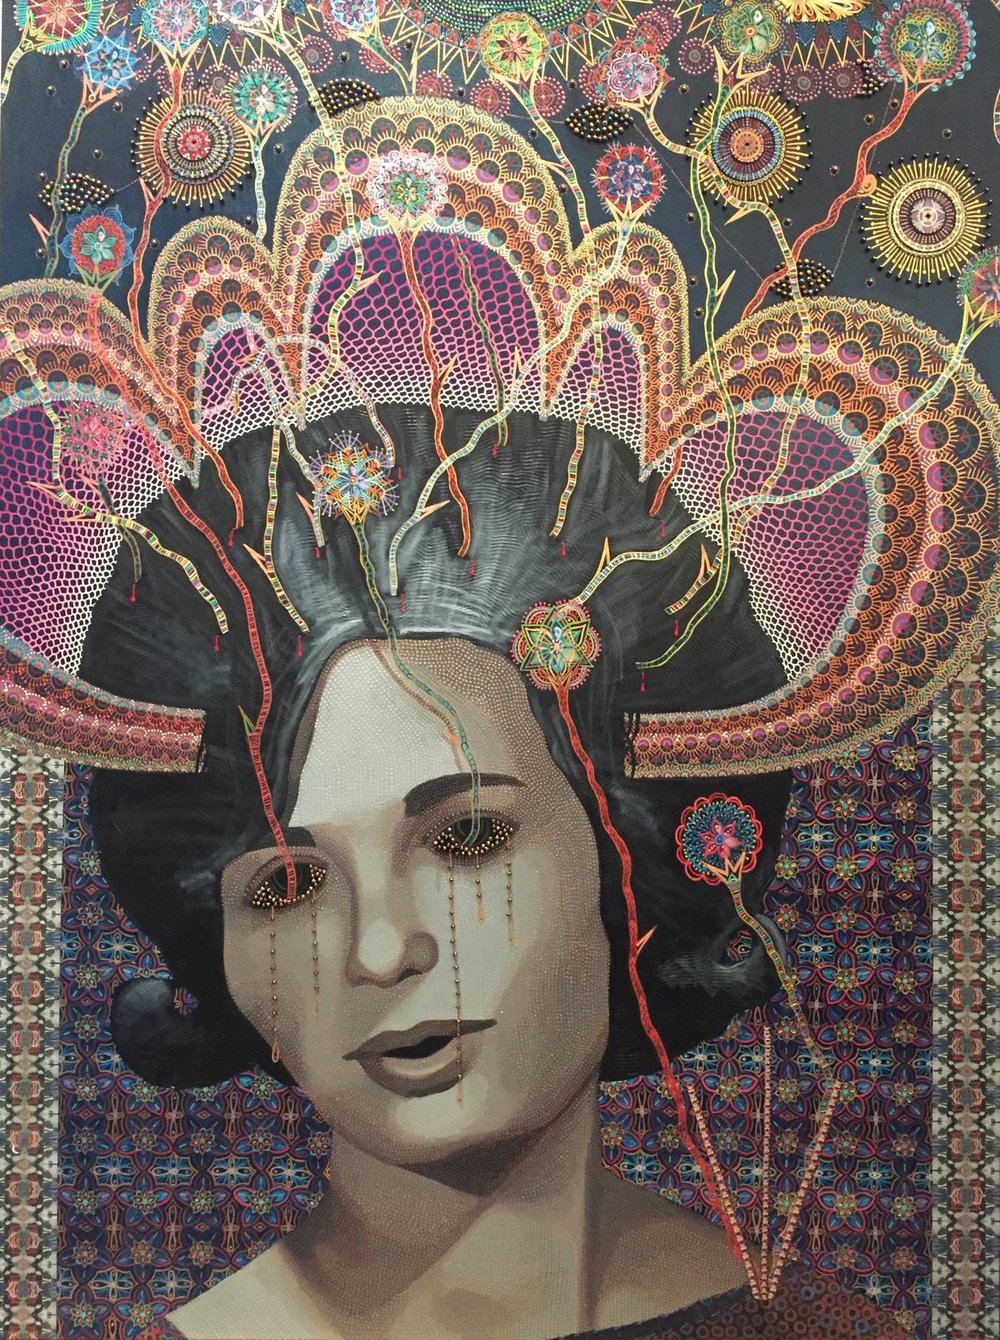 Les Femmes d'Alger #74, 2017